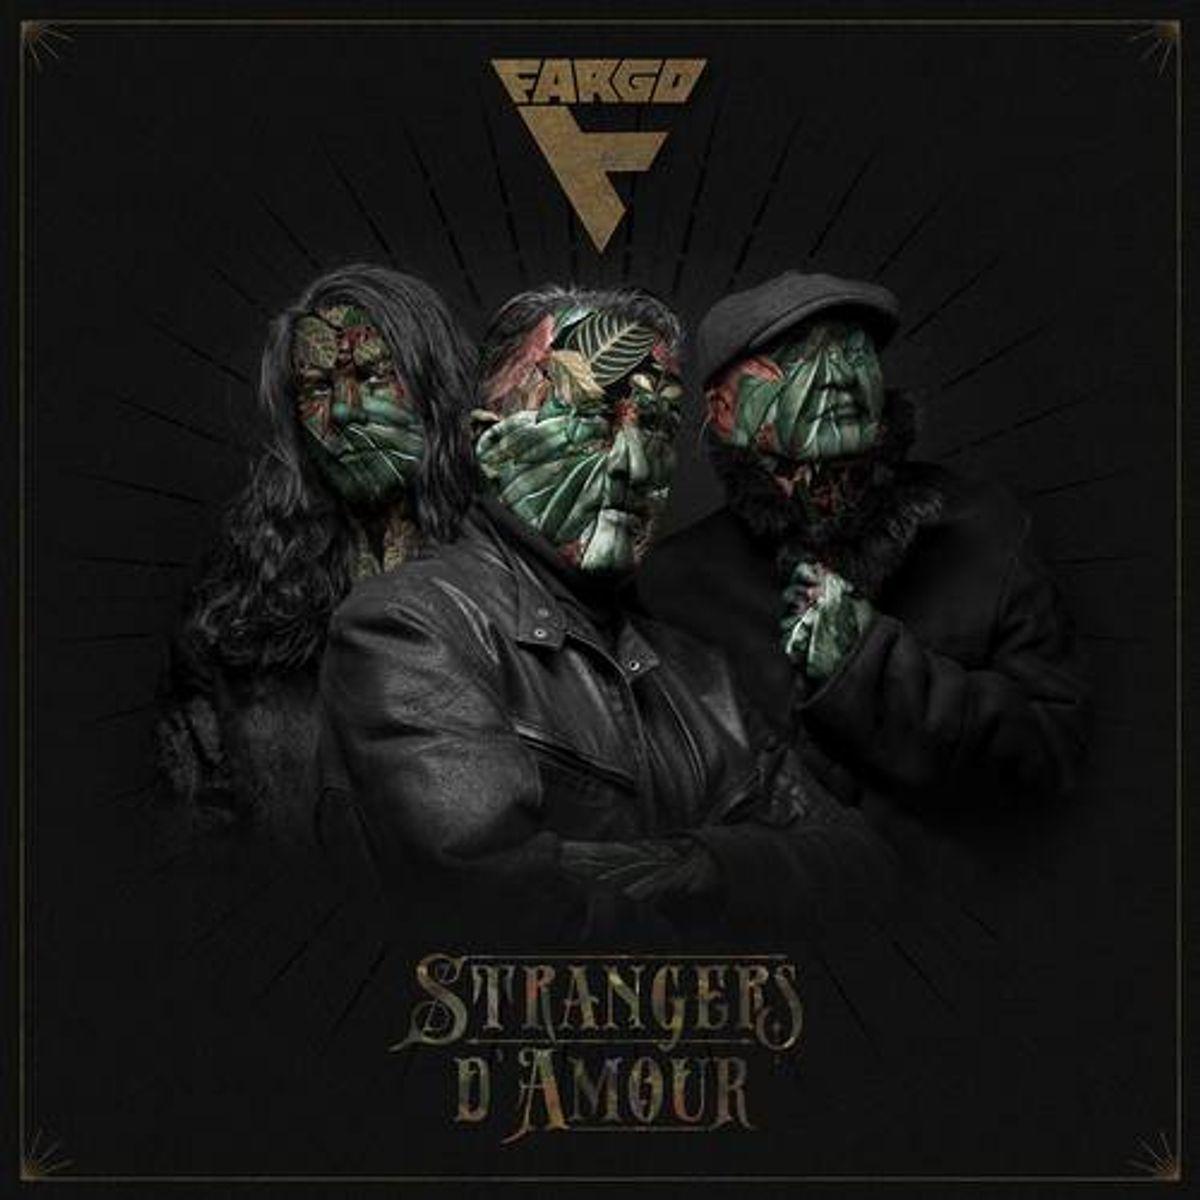 Strangers D'Amour